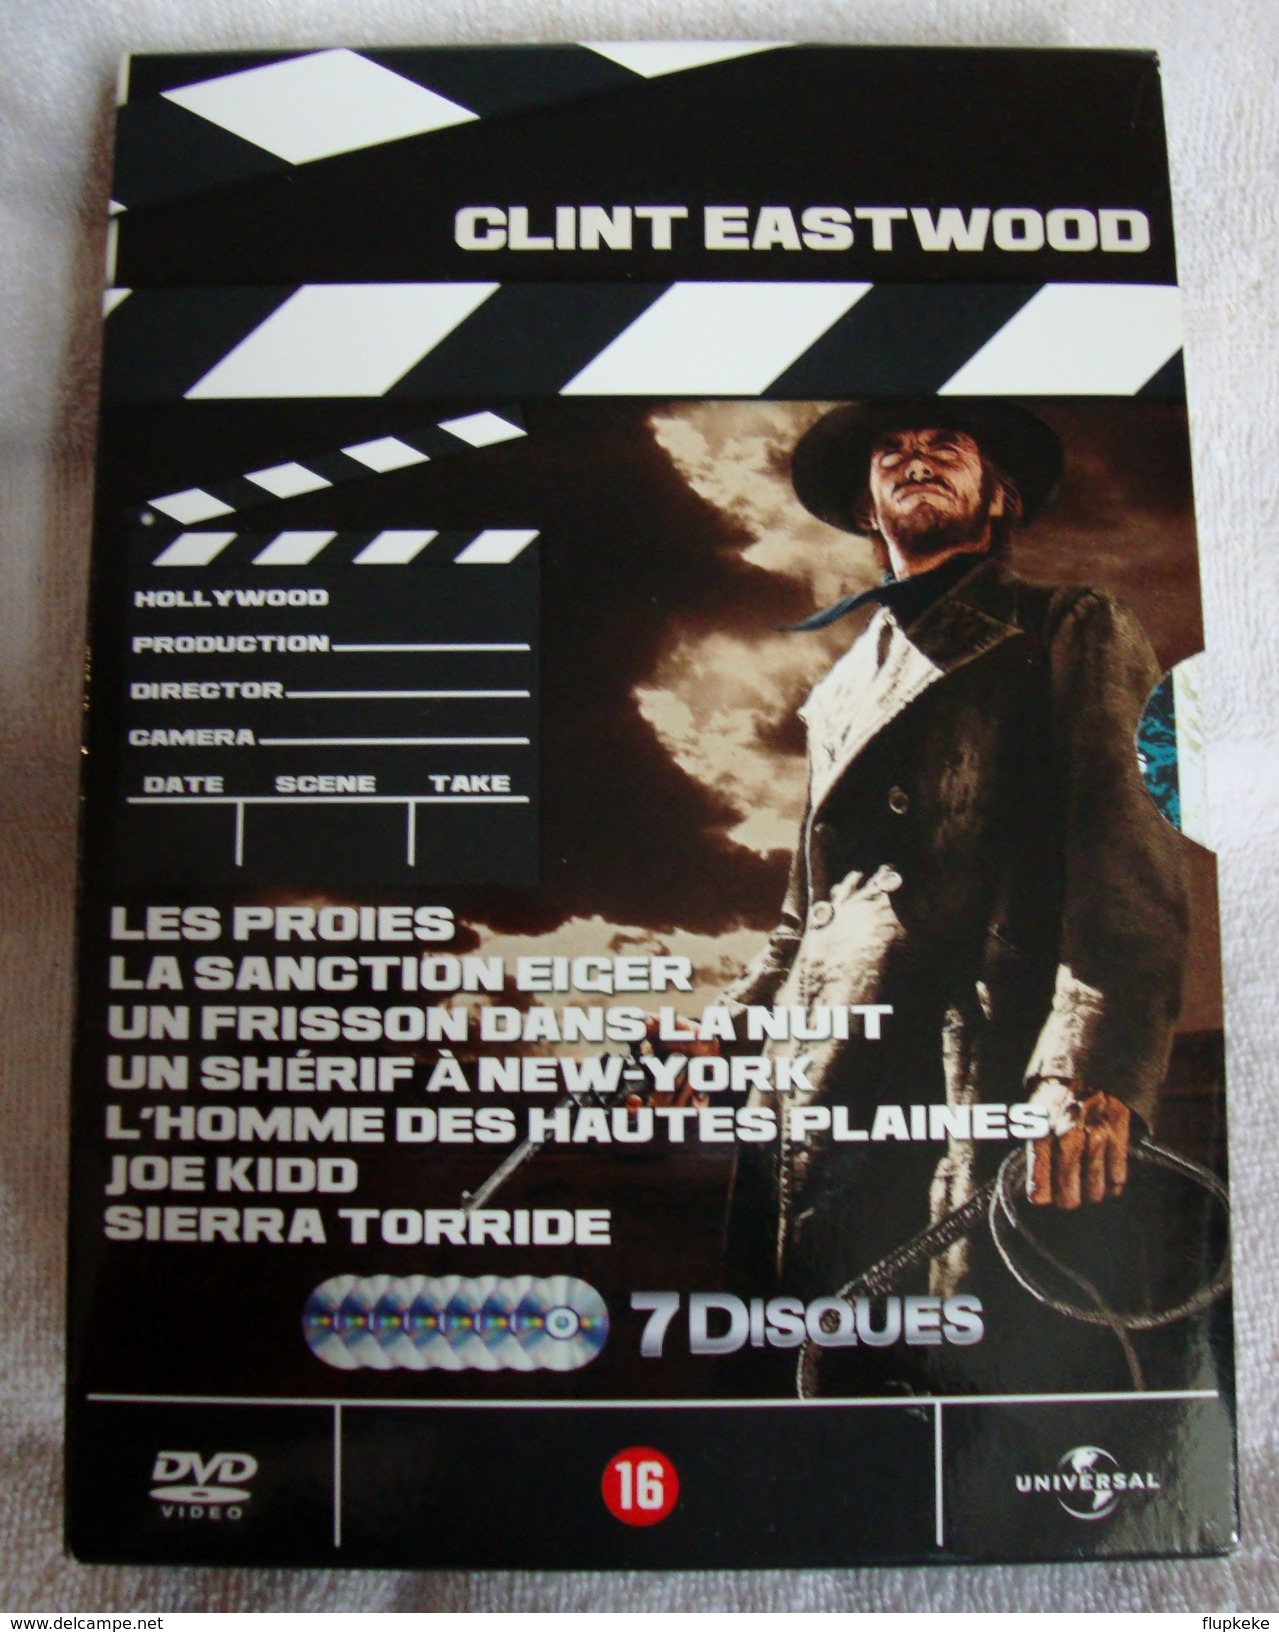 Dvd Zone 2 Clint Eastwood - Coffret 7 DVD Vf+Vostfr - Azione, Avventura